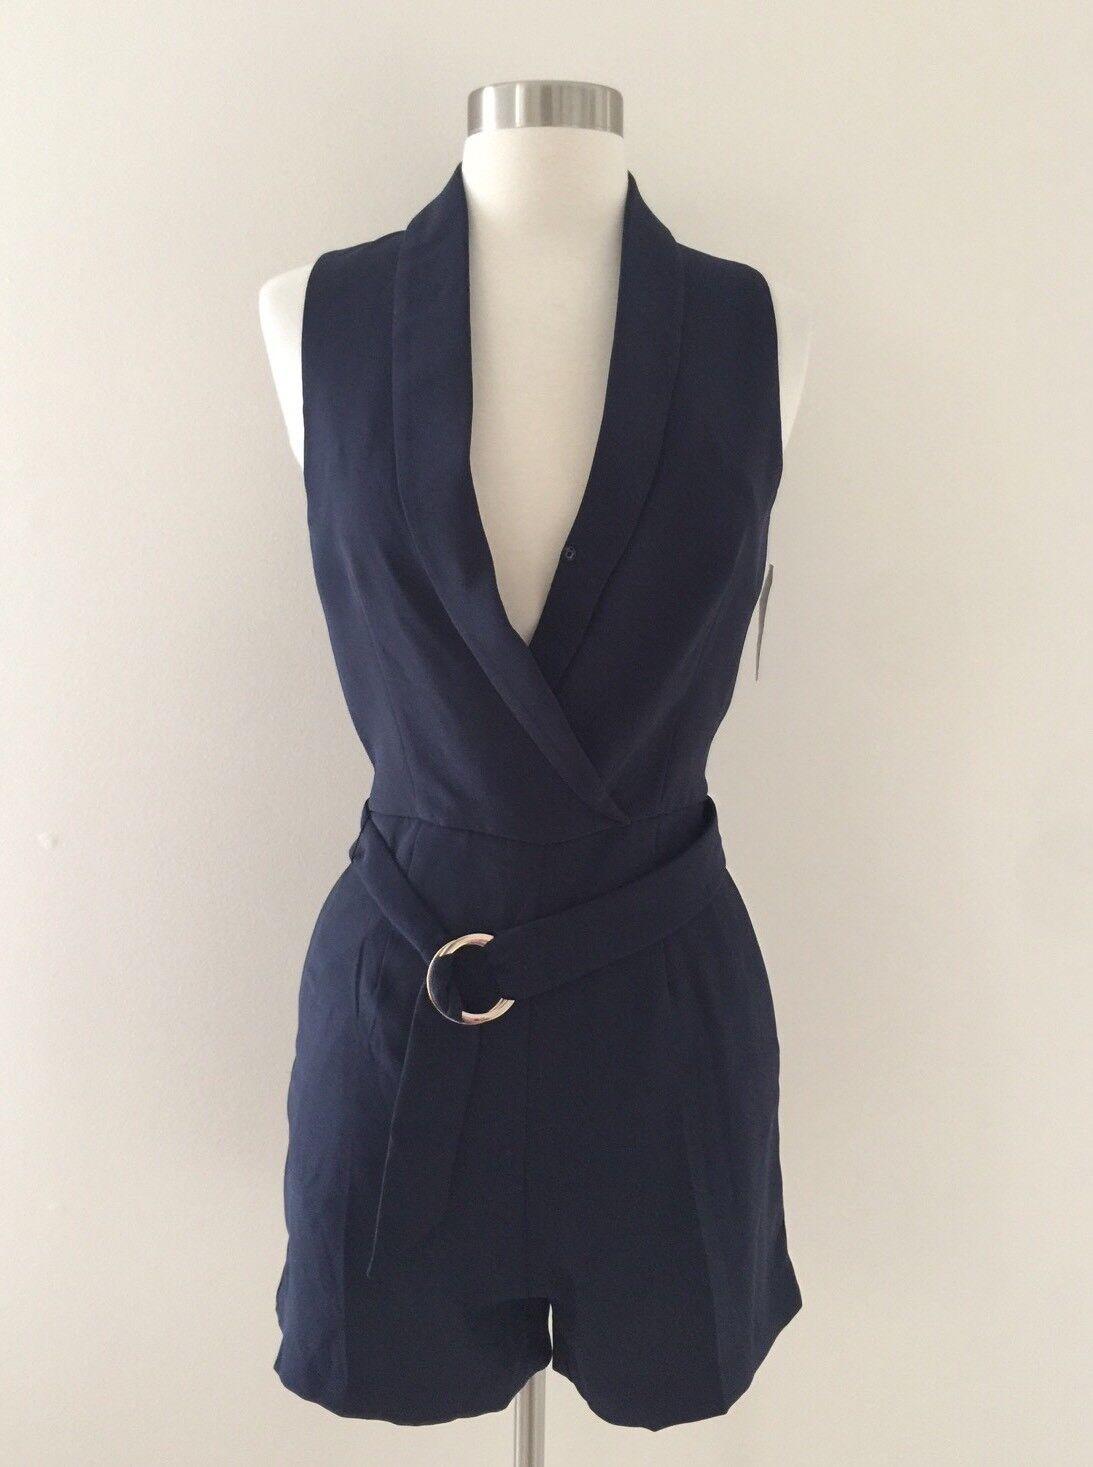 New H&M Women's Navy Suited Romper Shorts Suit Size 2